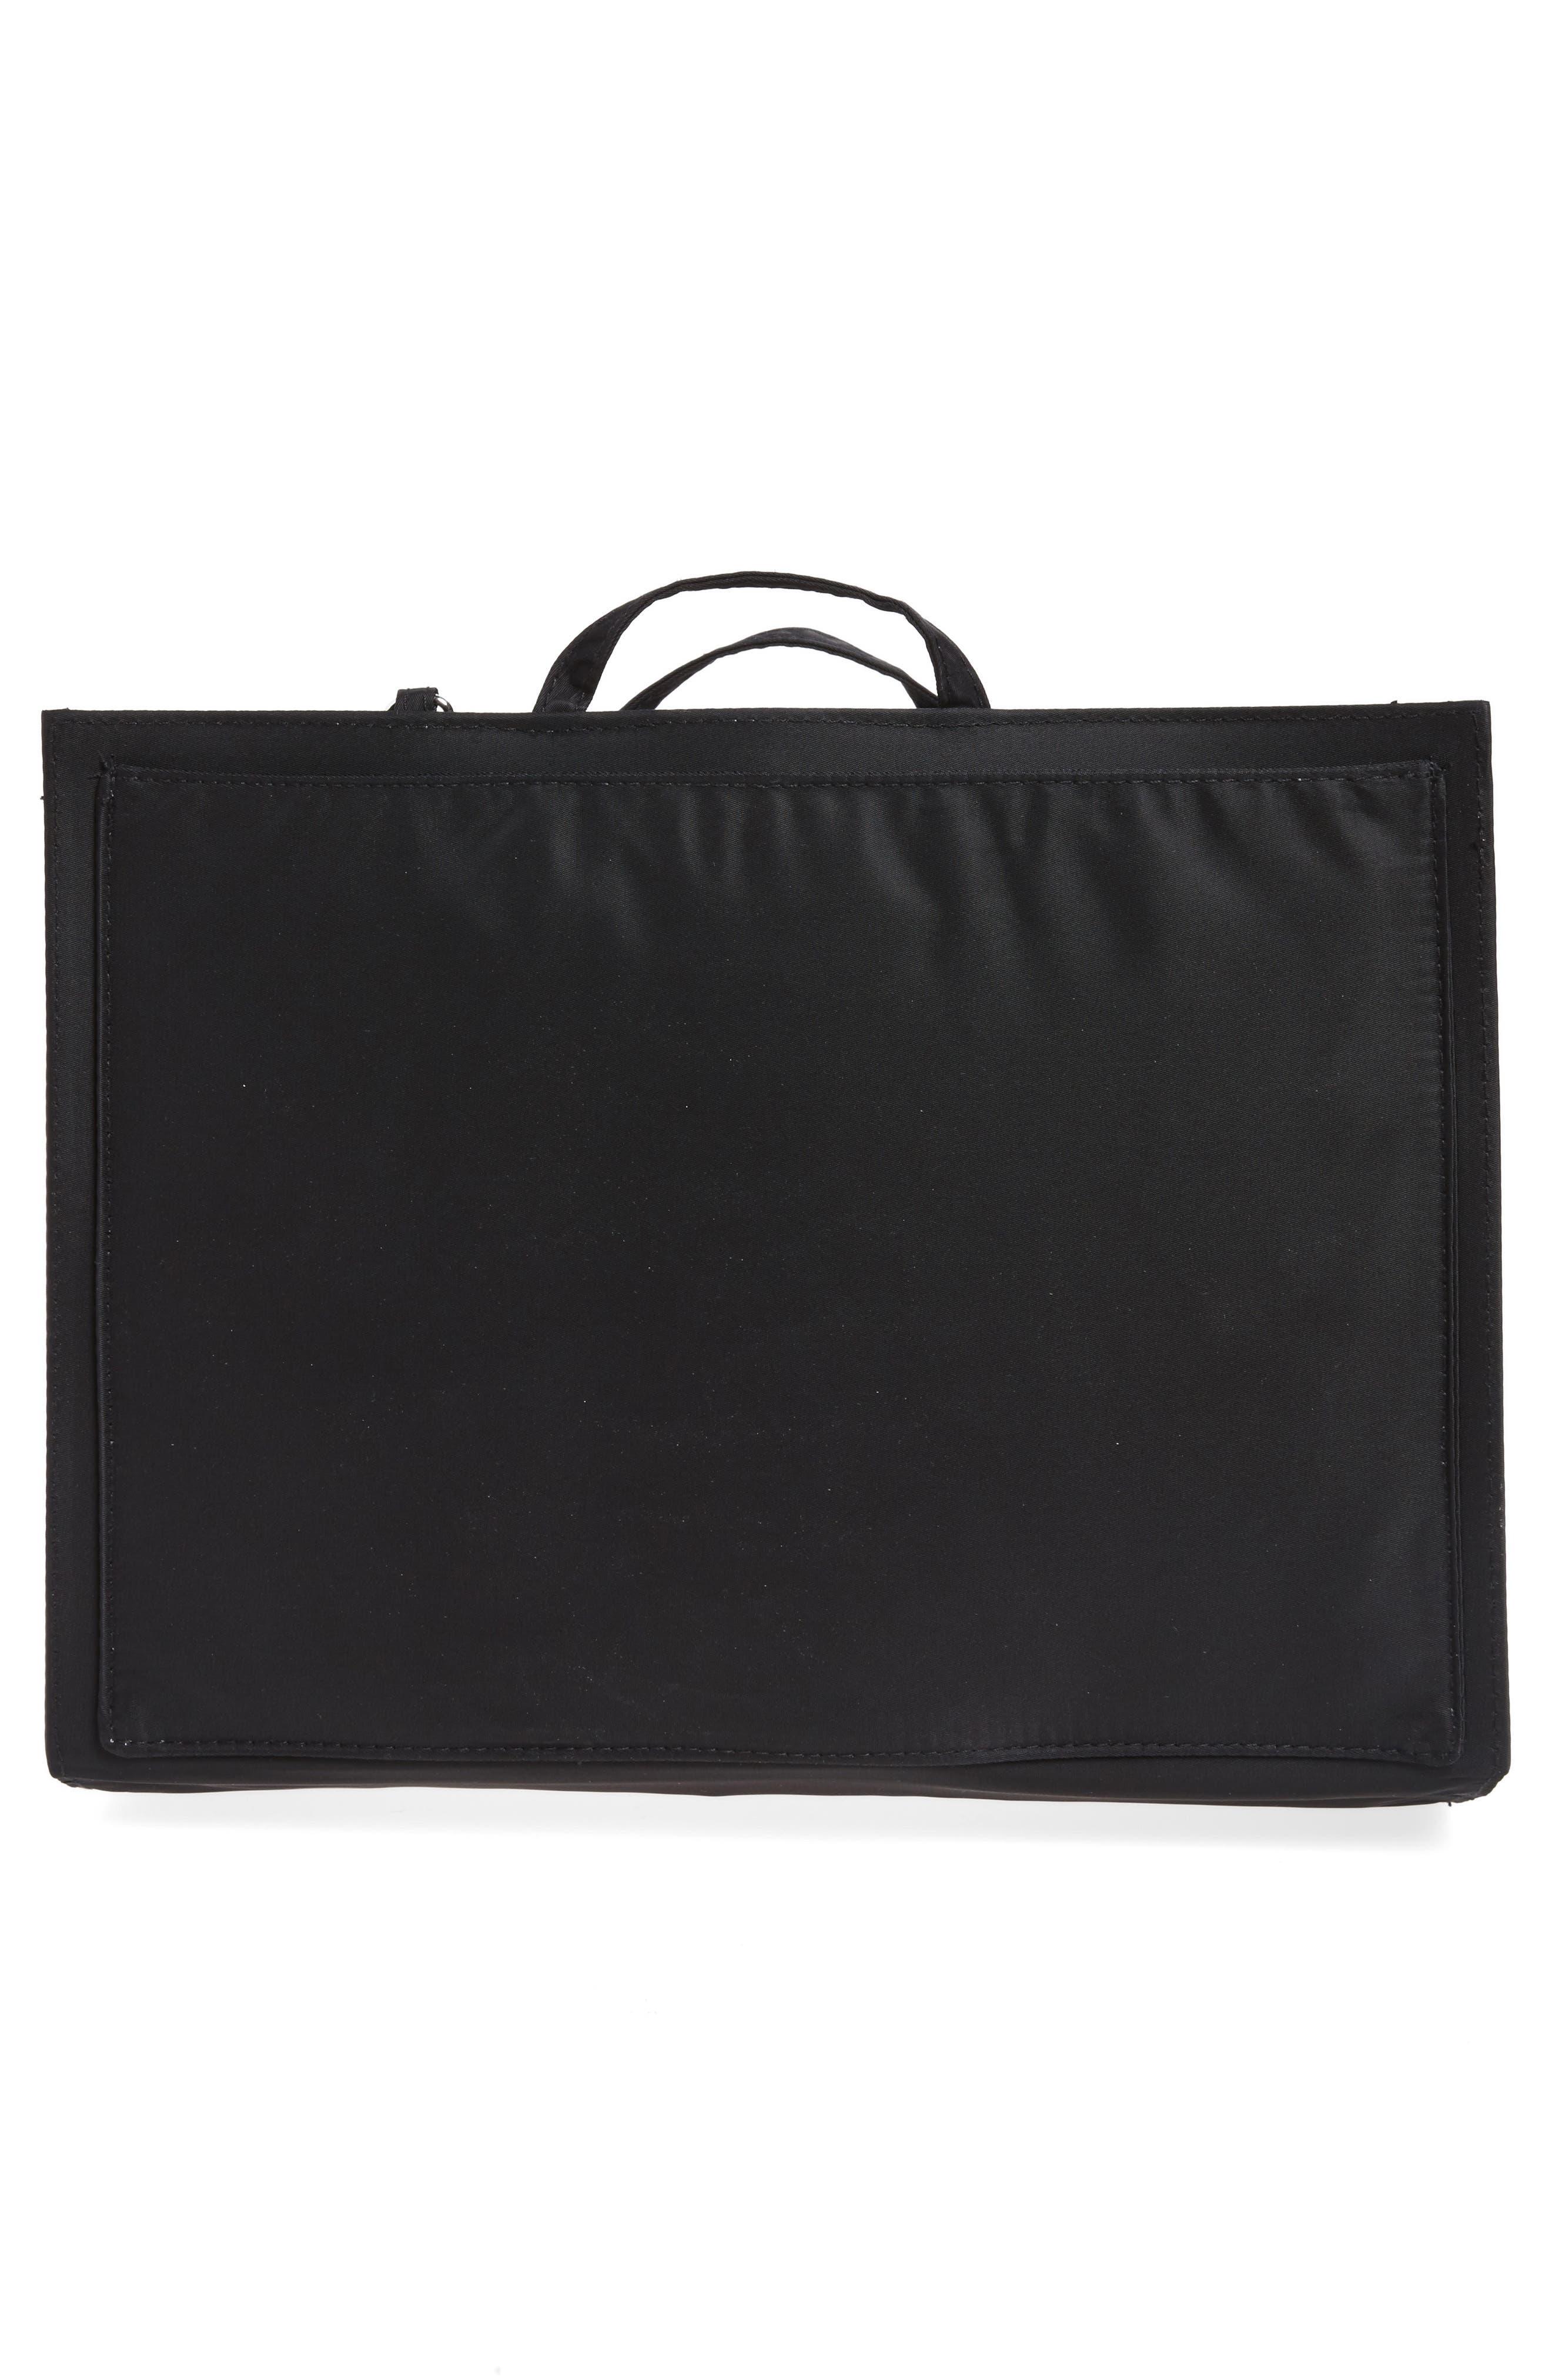 Organization Handbag Insert,                             Alternate thumbnail 3, color,                             CLASSIC BLACK